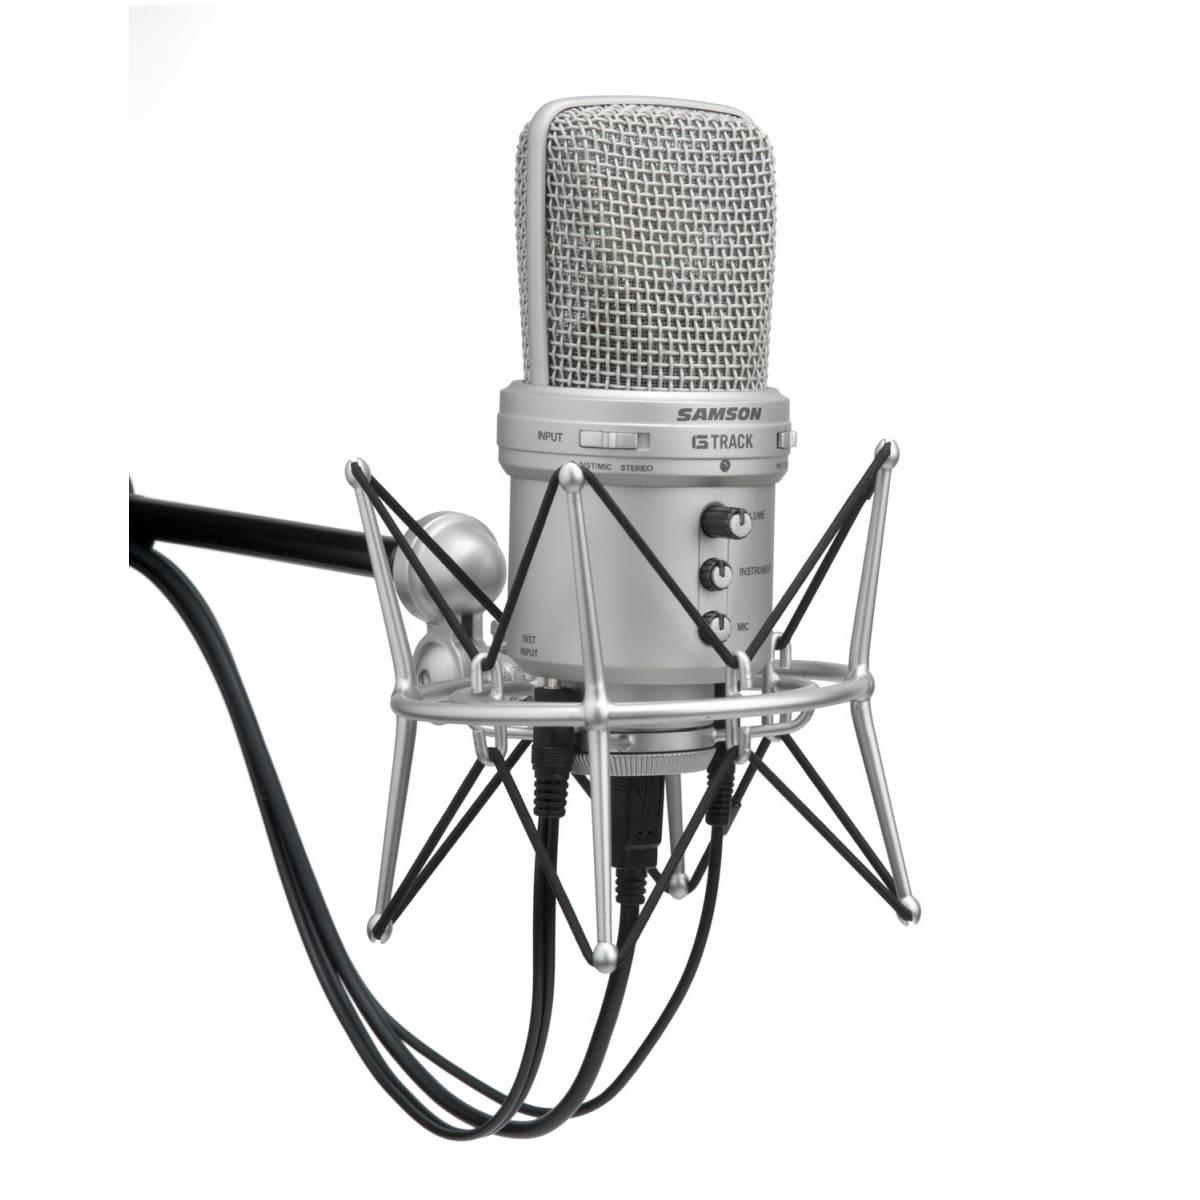 New Samson G Track Usb Studio Condenser Microphone